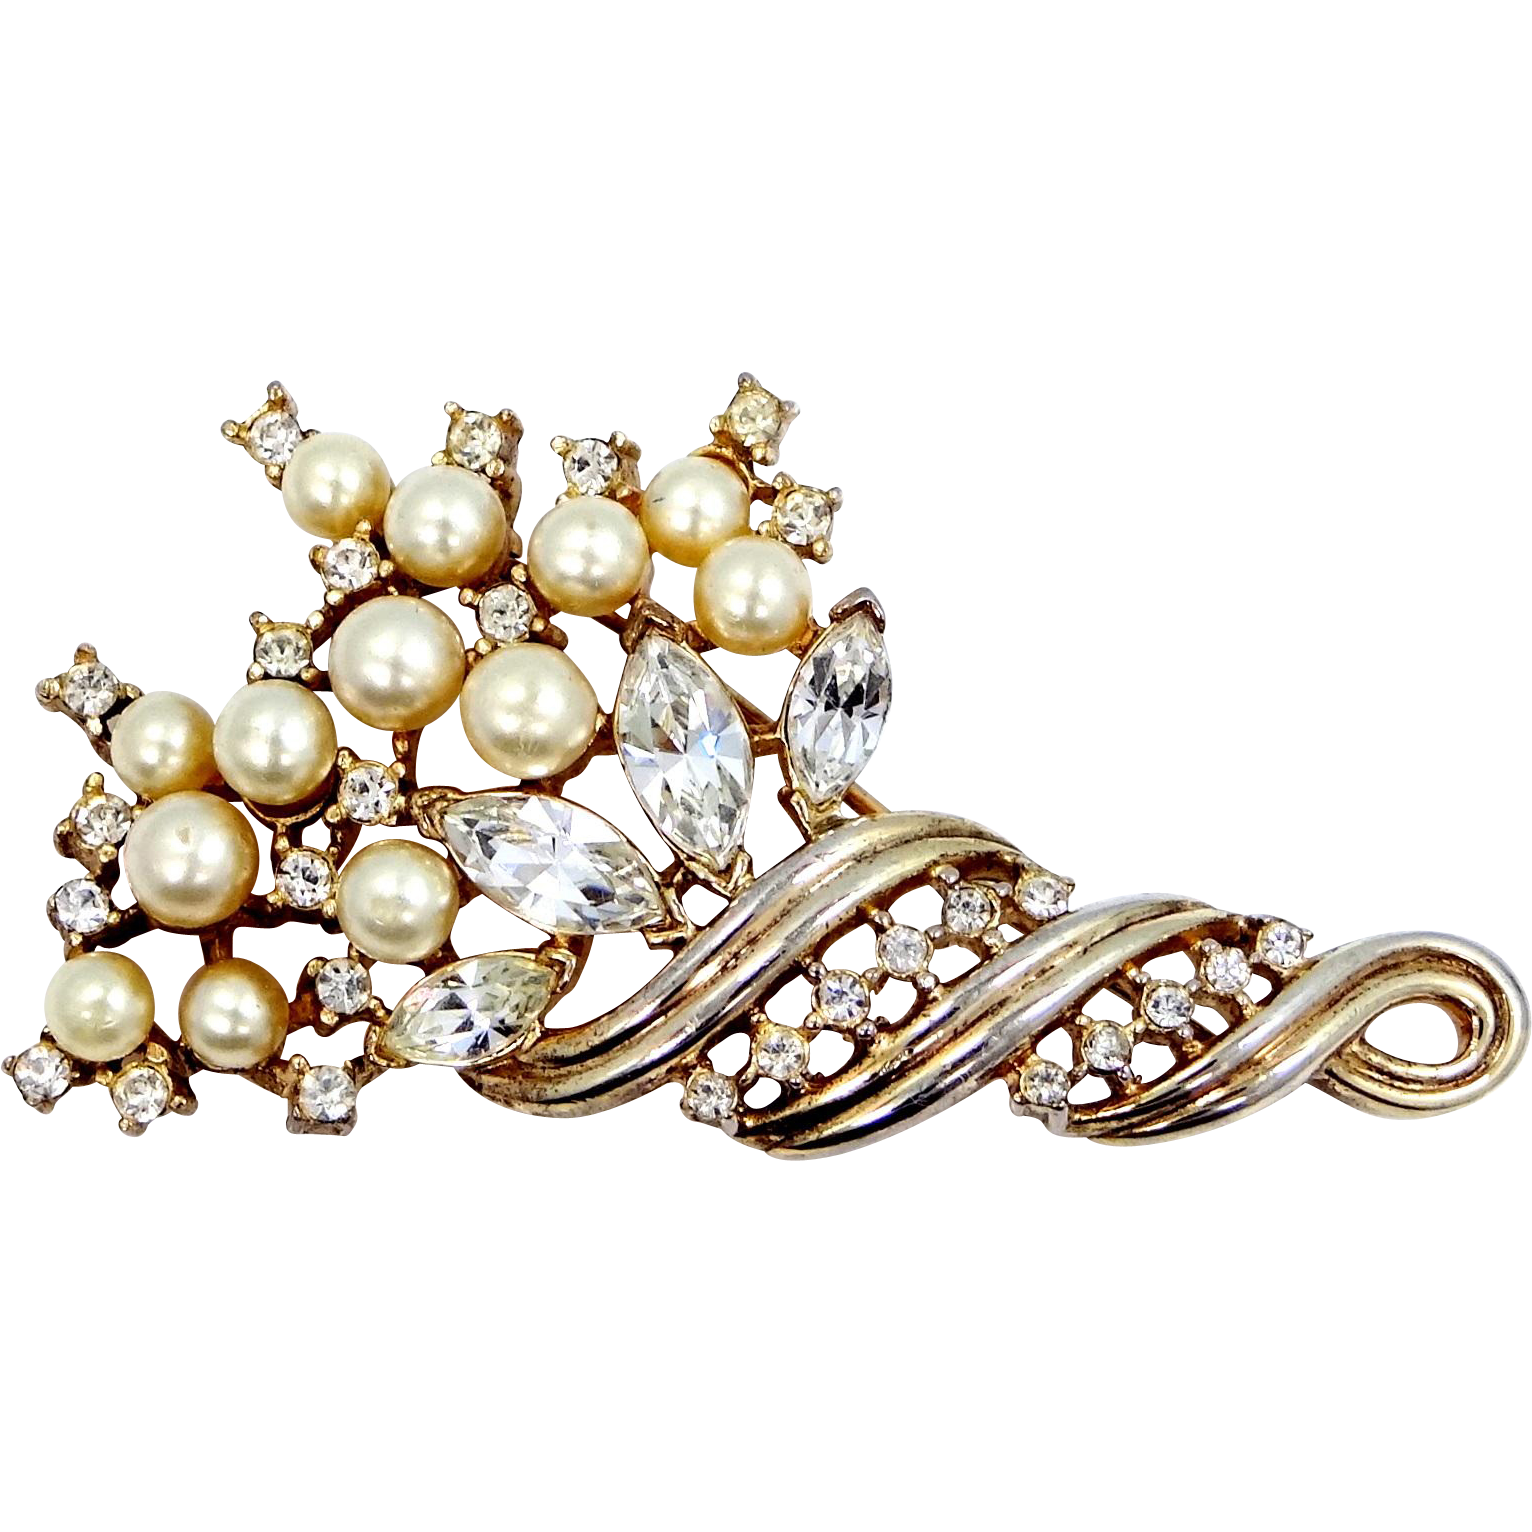 Trifari Alfred Philippe Gold Tone Cornucopia Pin